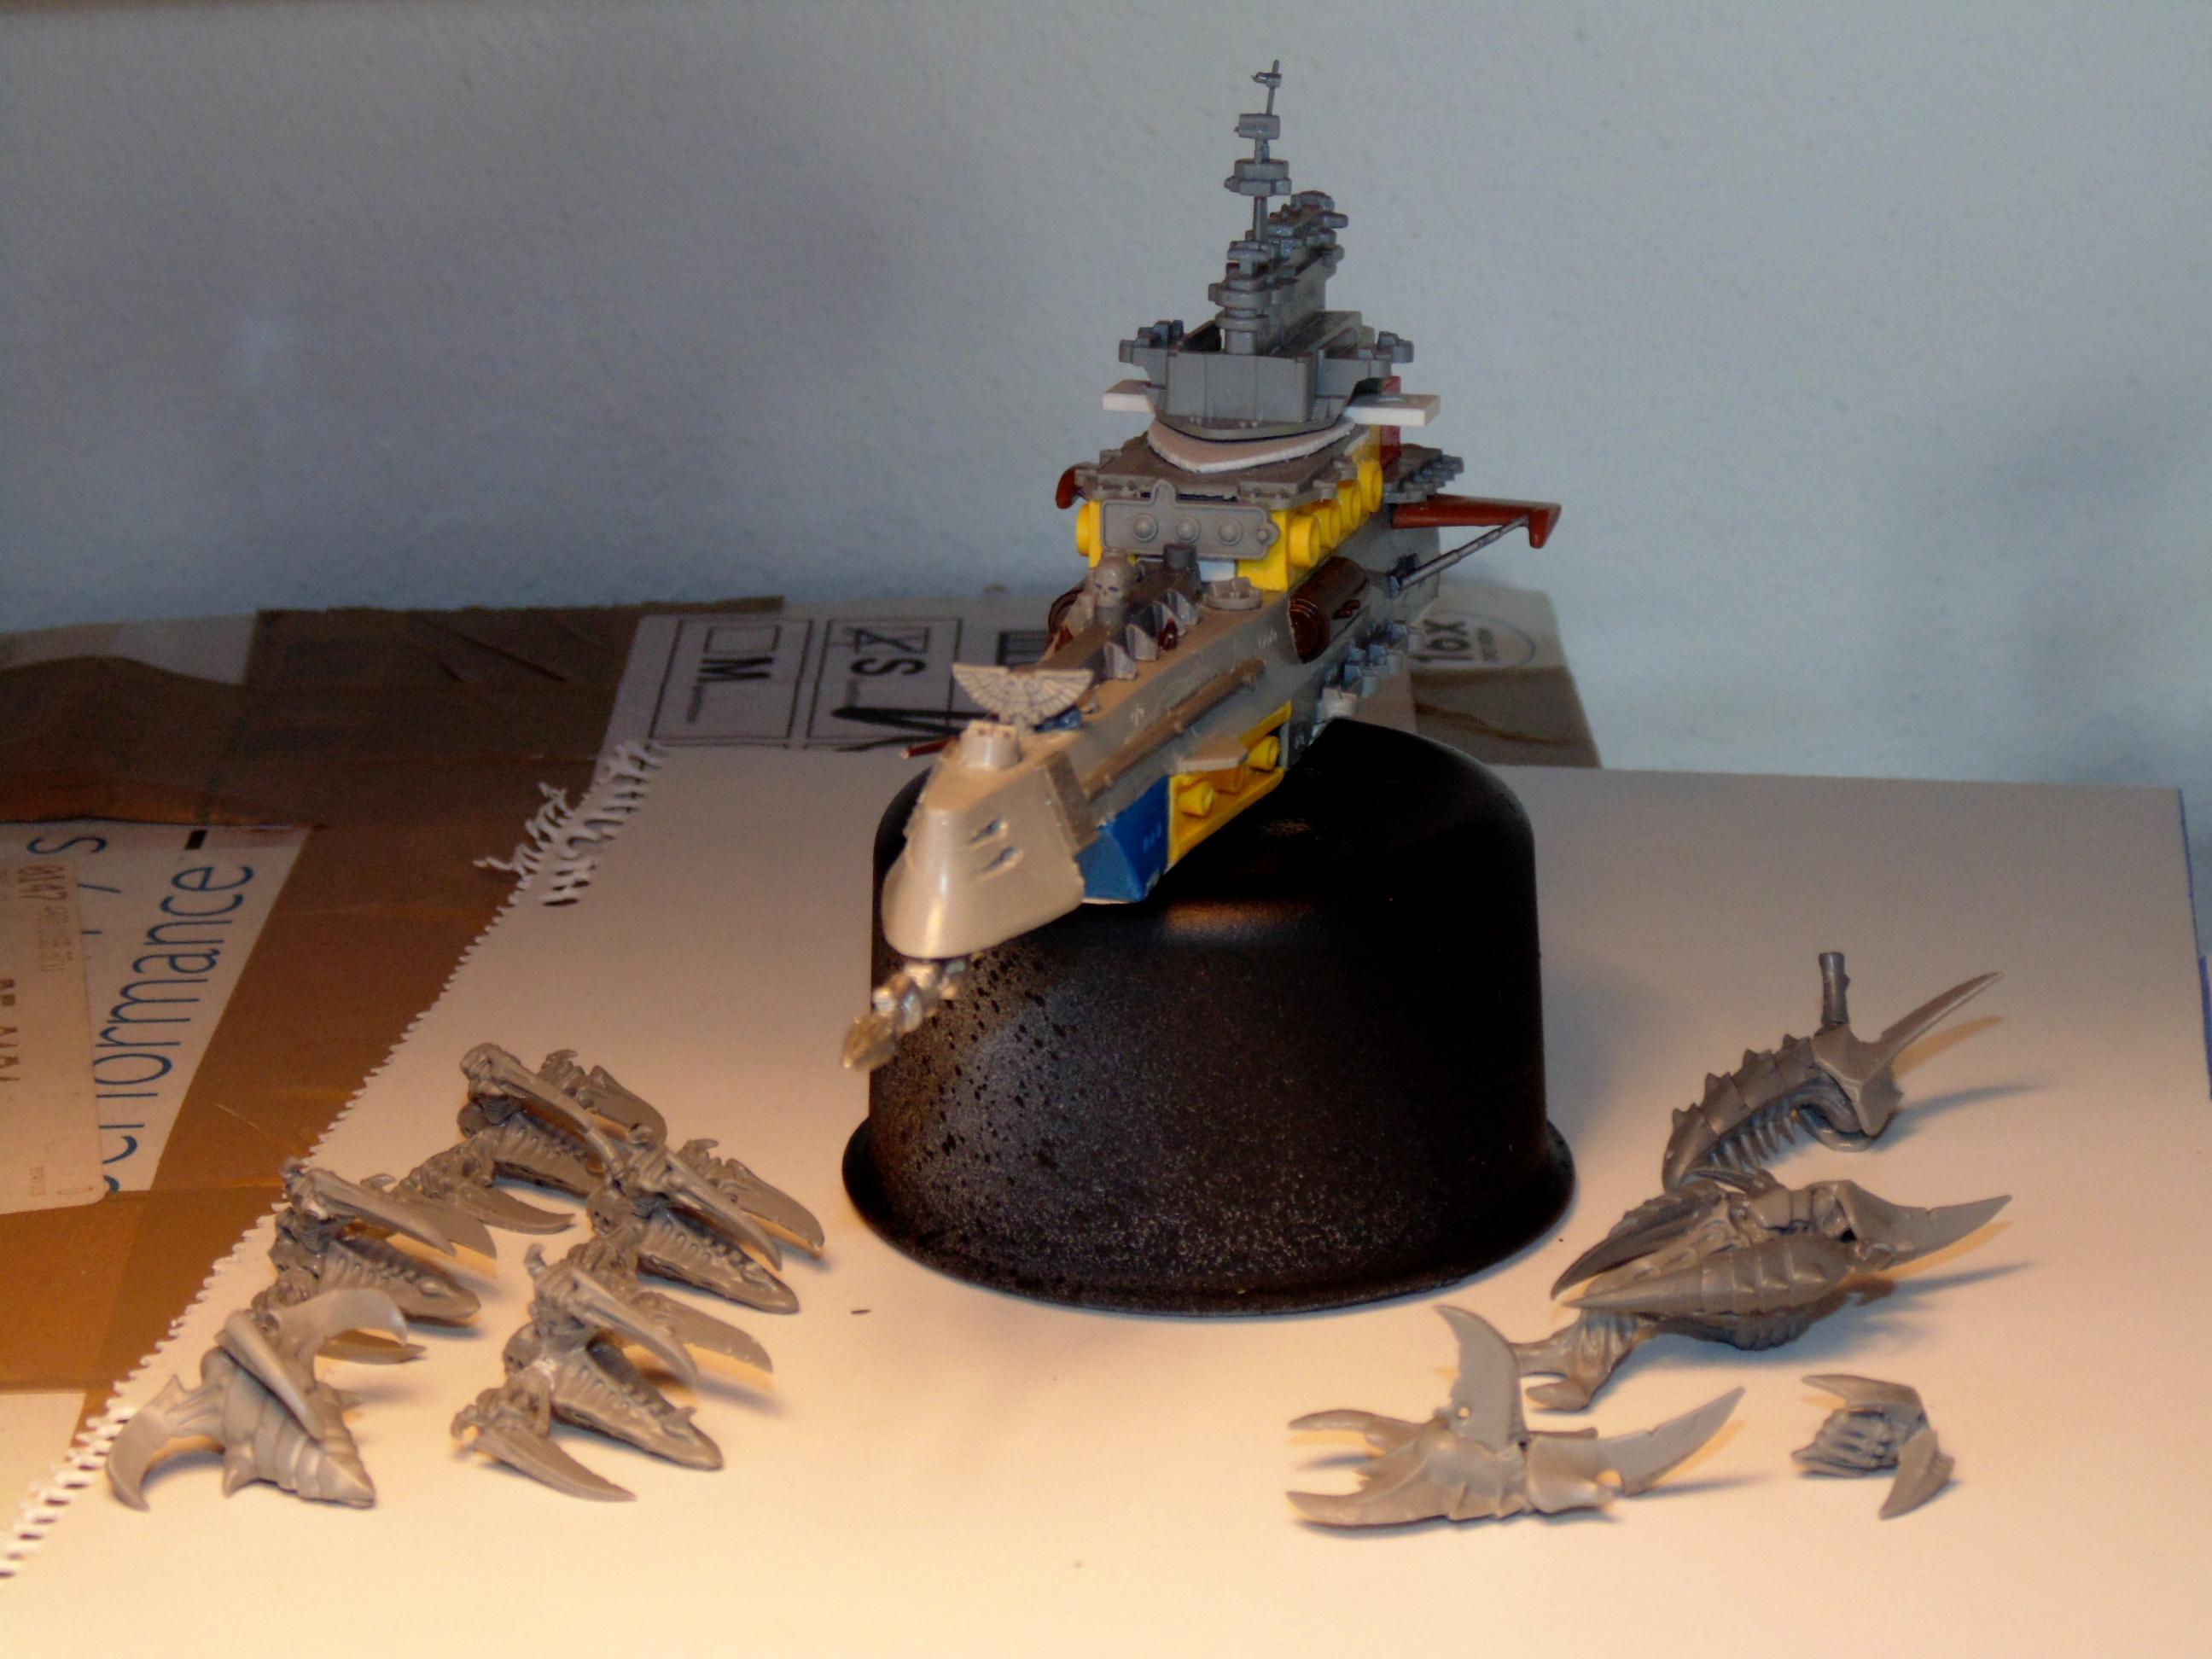 Battlefleet, Battleship, Conversion, Drone, Escort, Fleet, Gothic, Hive, Imperial, Kraken, Mothership, Scratch, Scratch Build, Ship, Ships, Tyranids, Vanguard